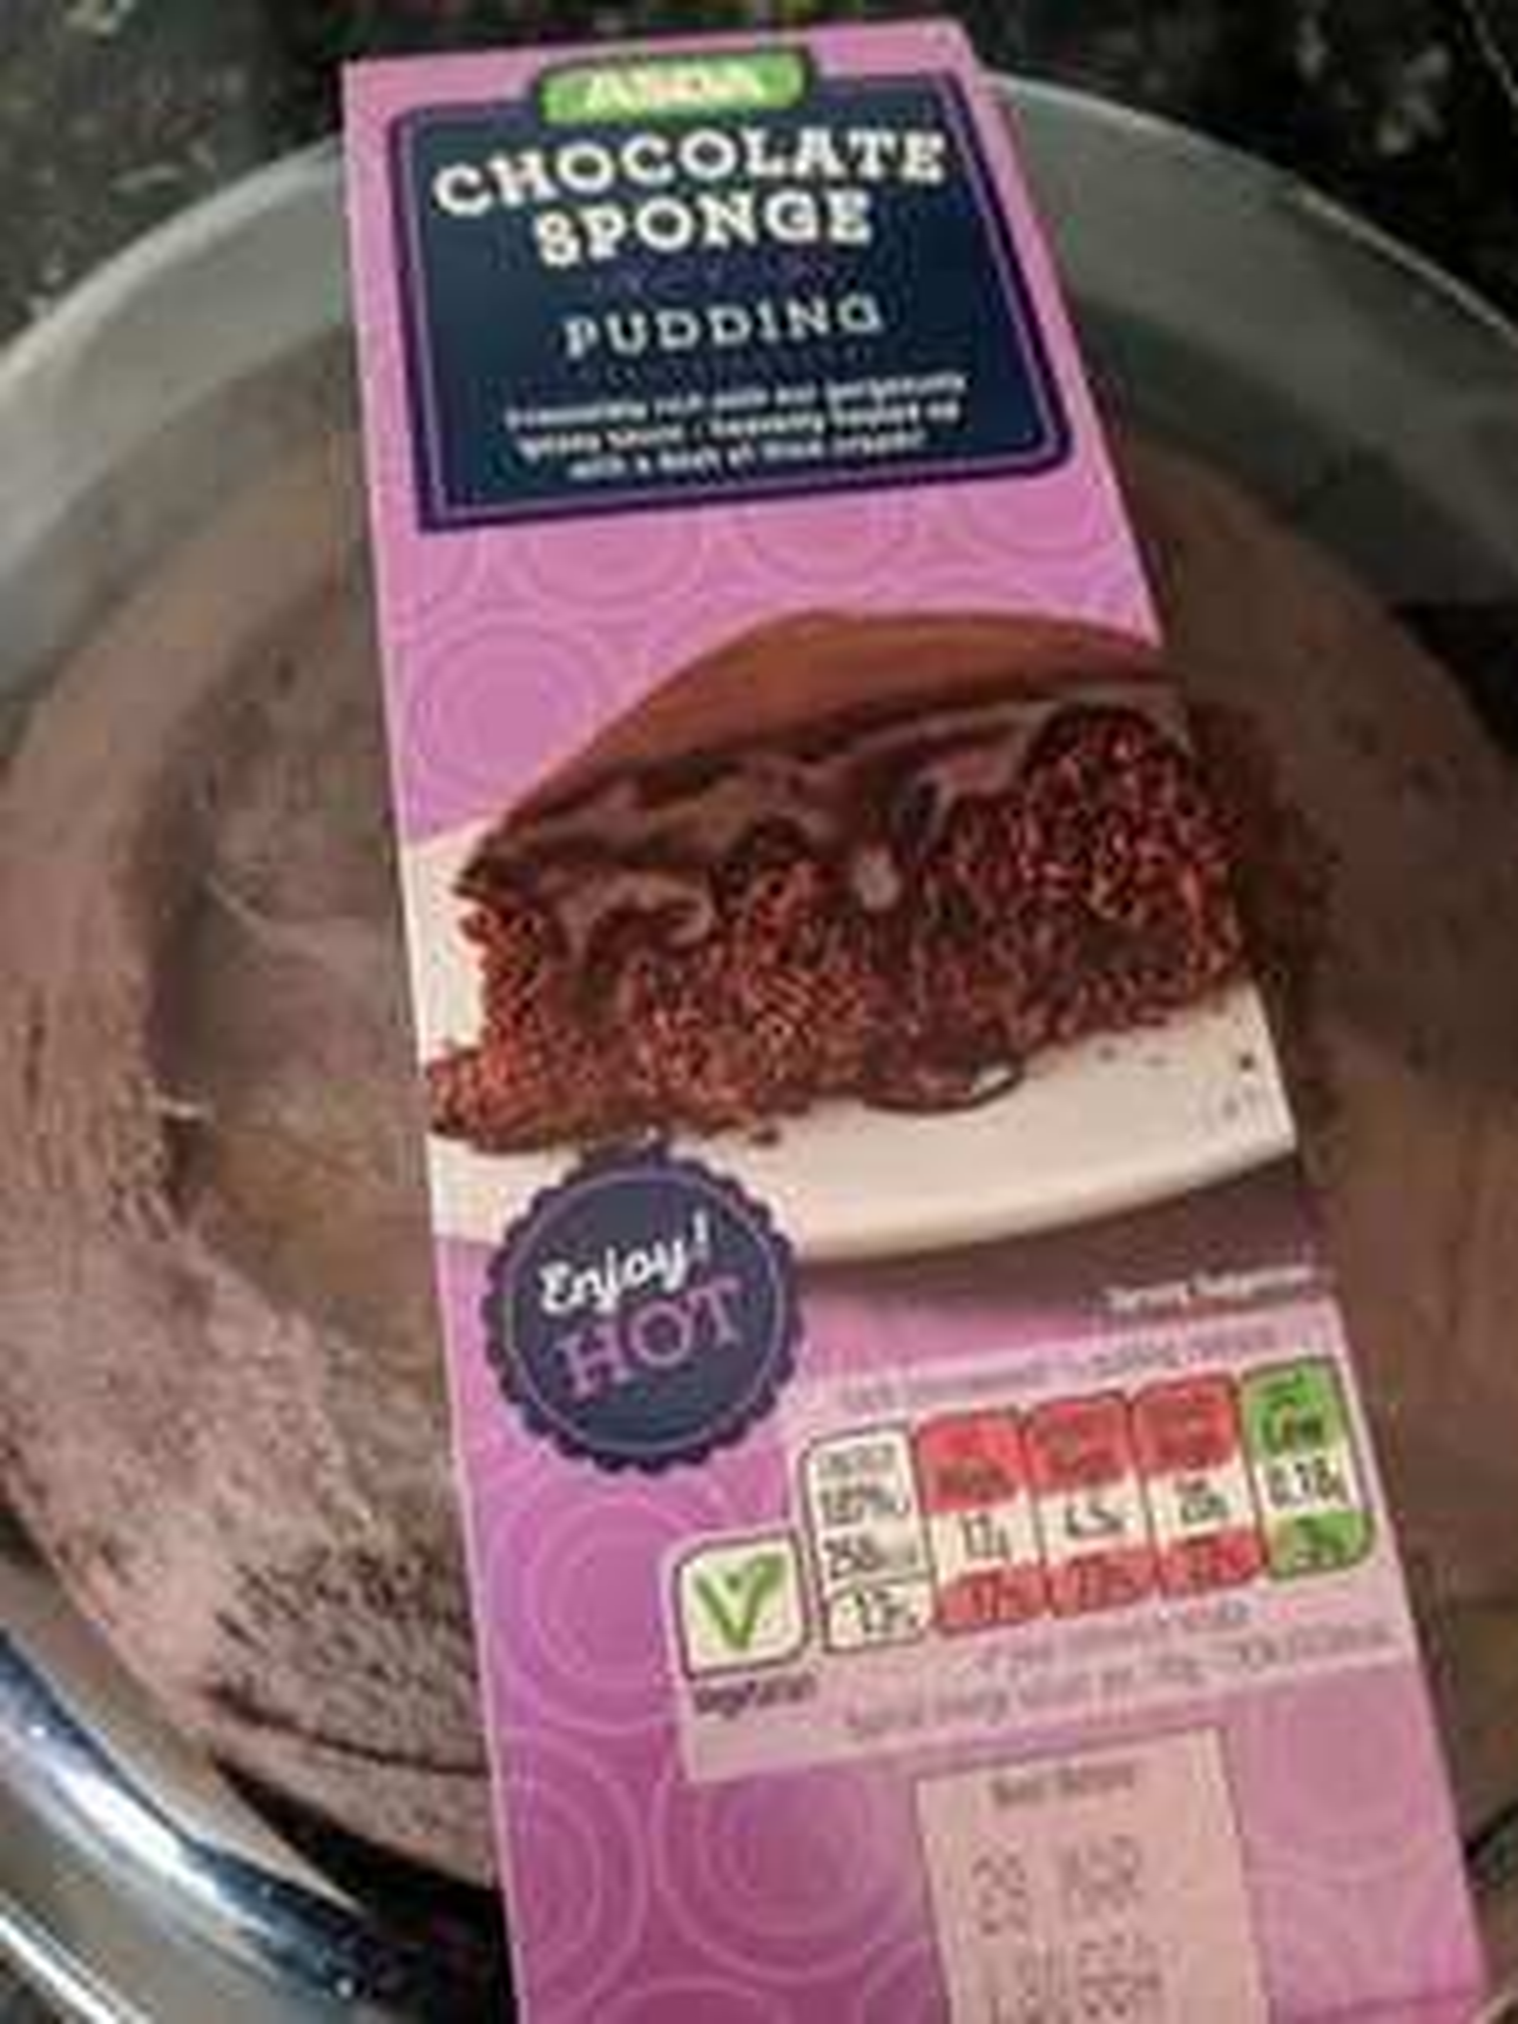 ASDA chocolate pudding half price - £1.50 instore